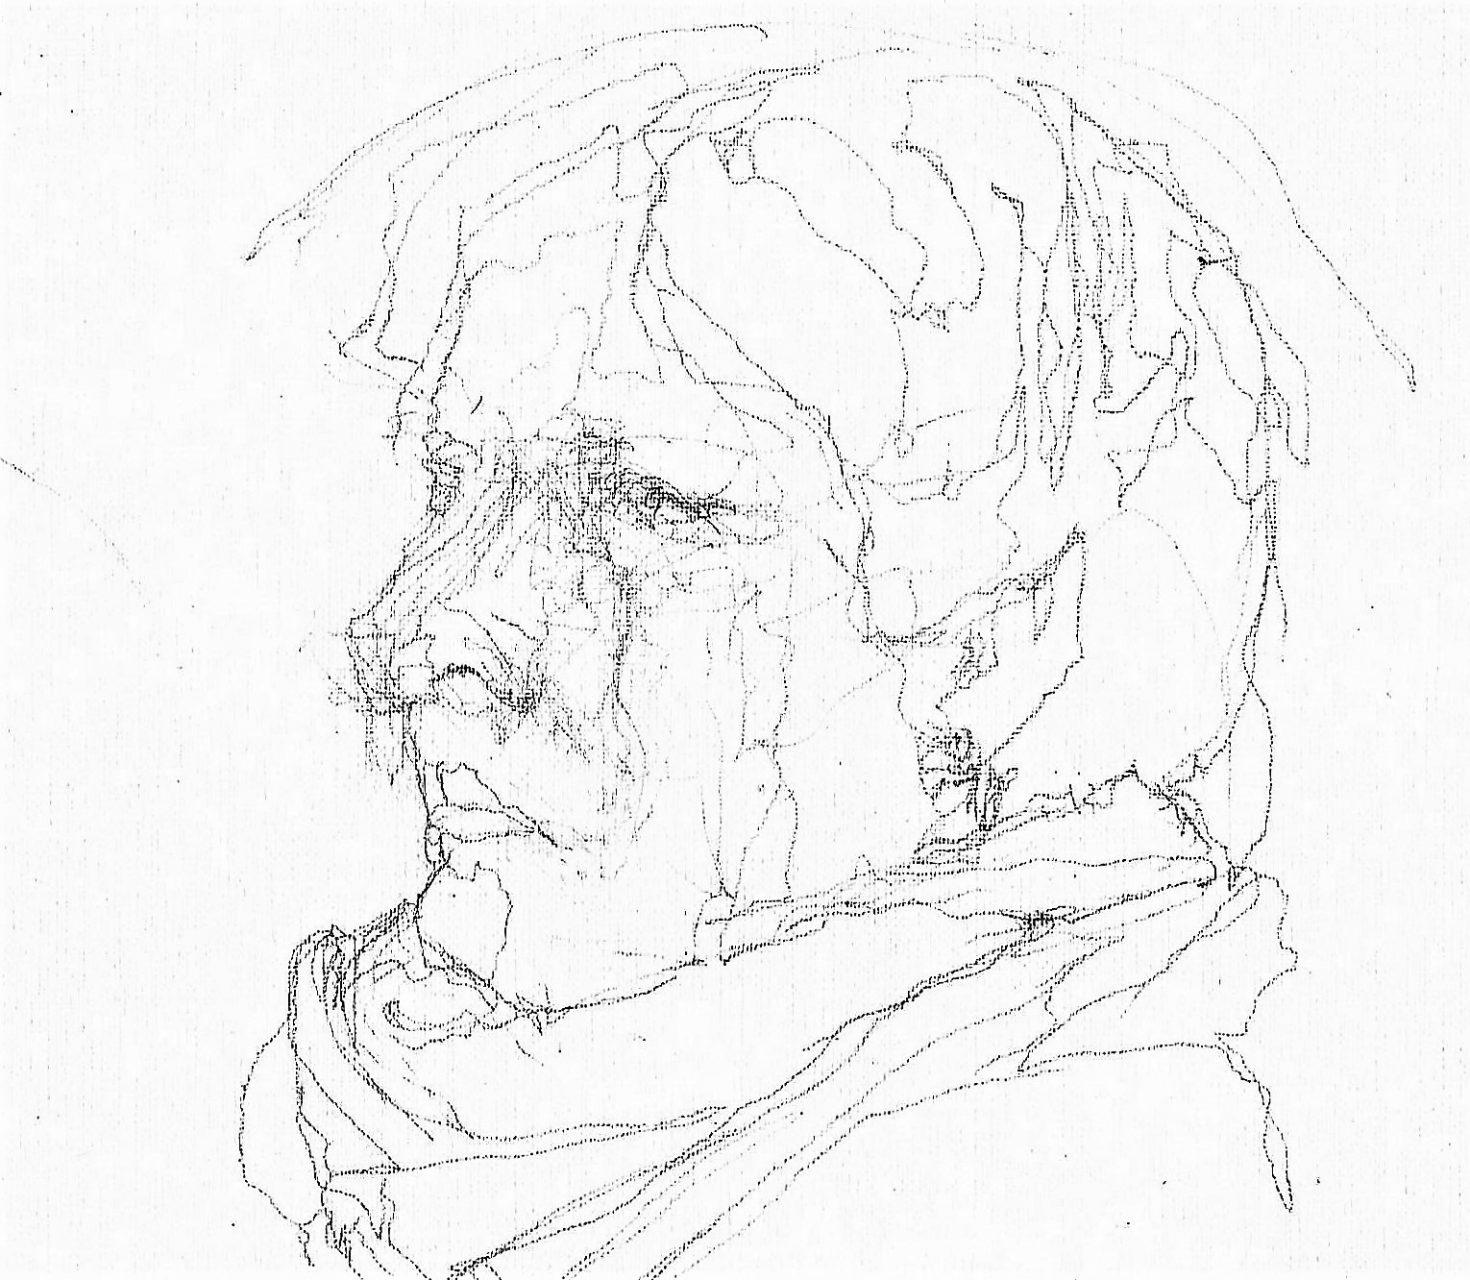 365 dagen een portret Marion, model Tekening 19c25